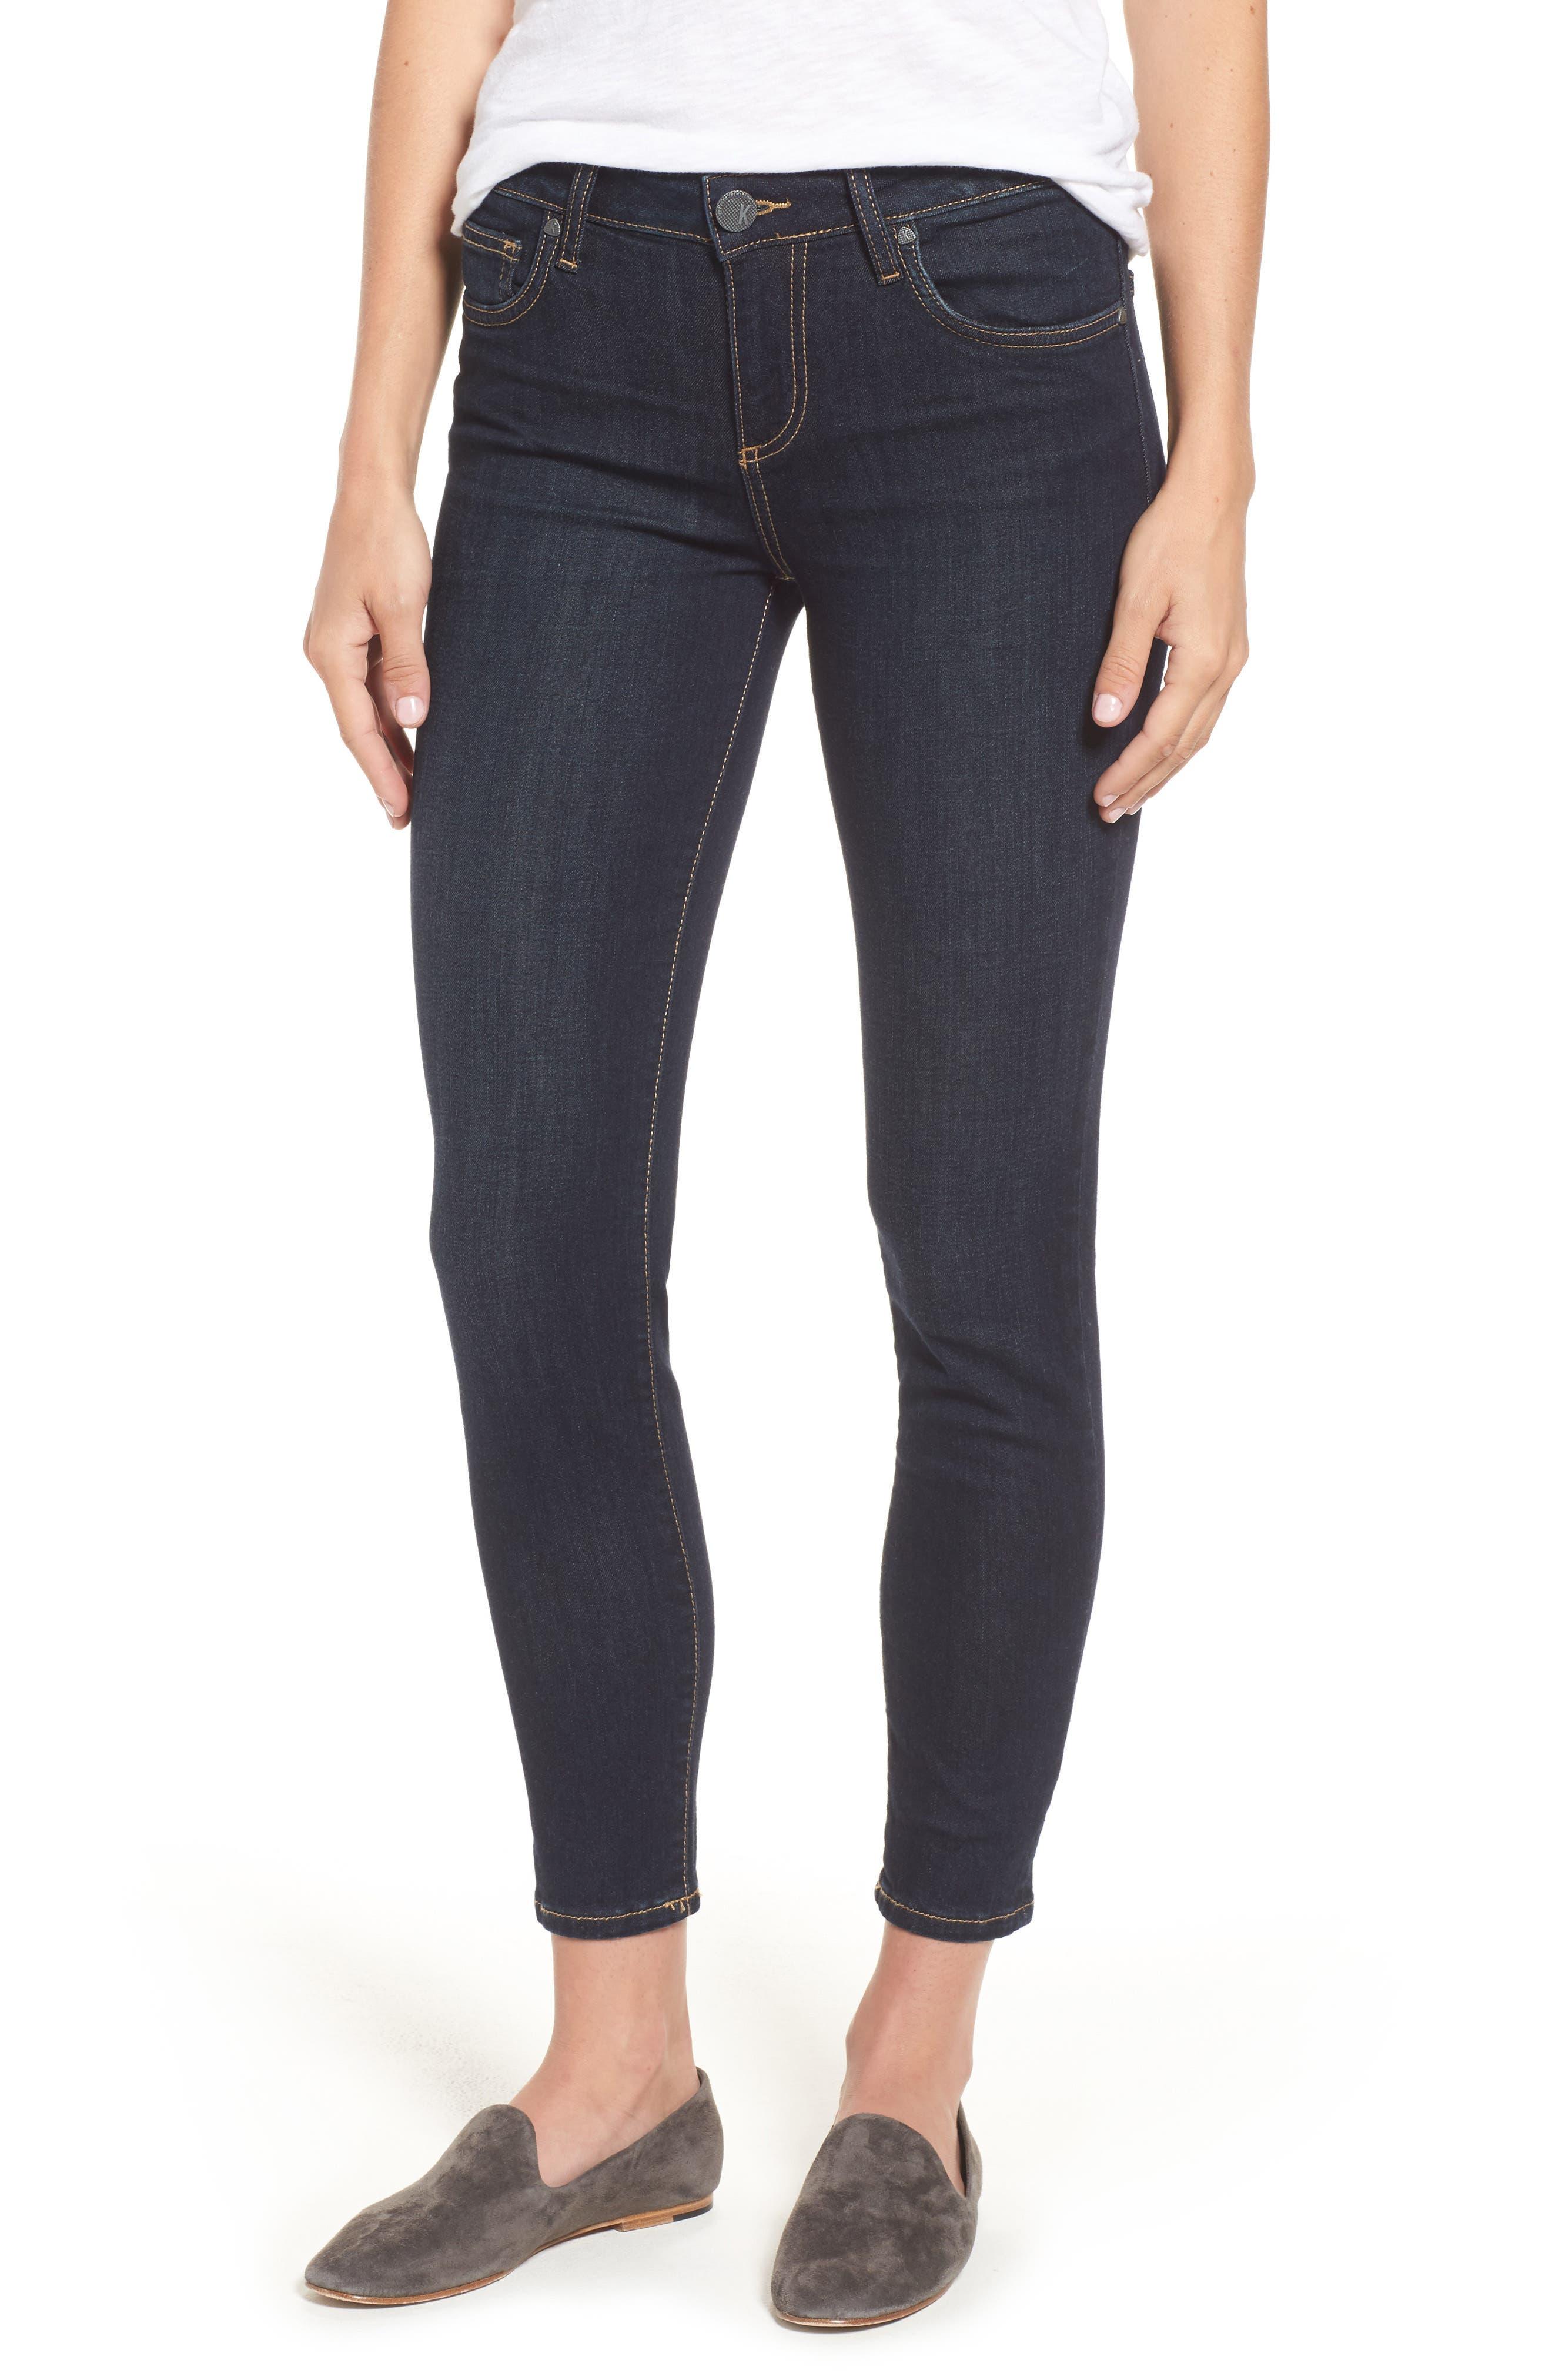 Diana Kurvy Stretch Ankle Jeans,                             Main thumbnail 1, color,                             490